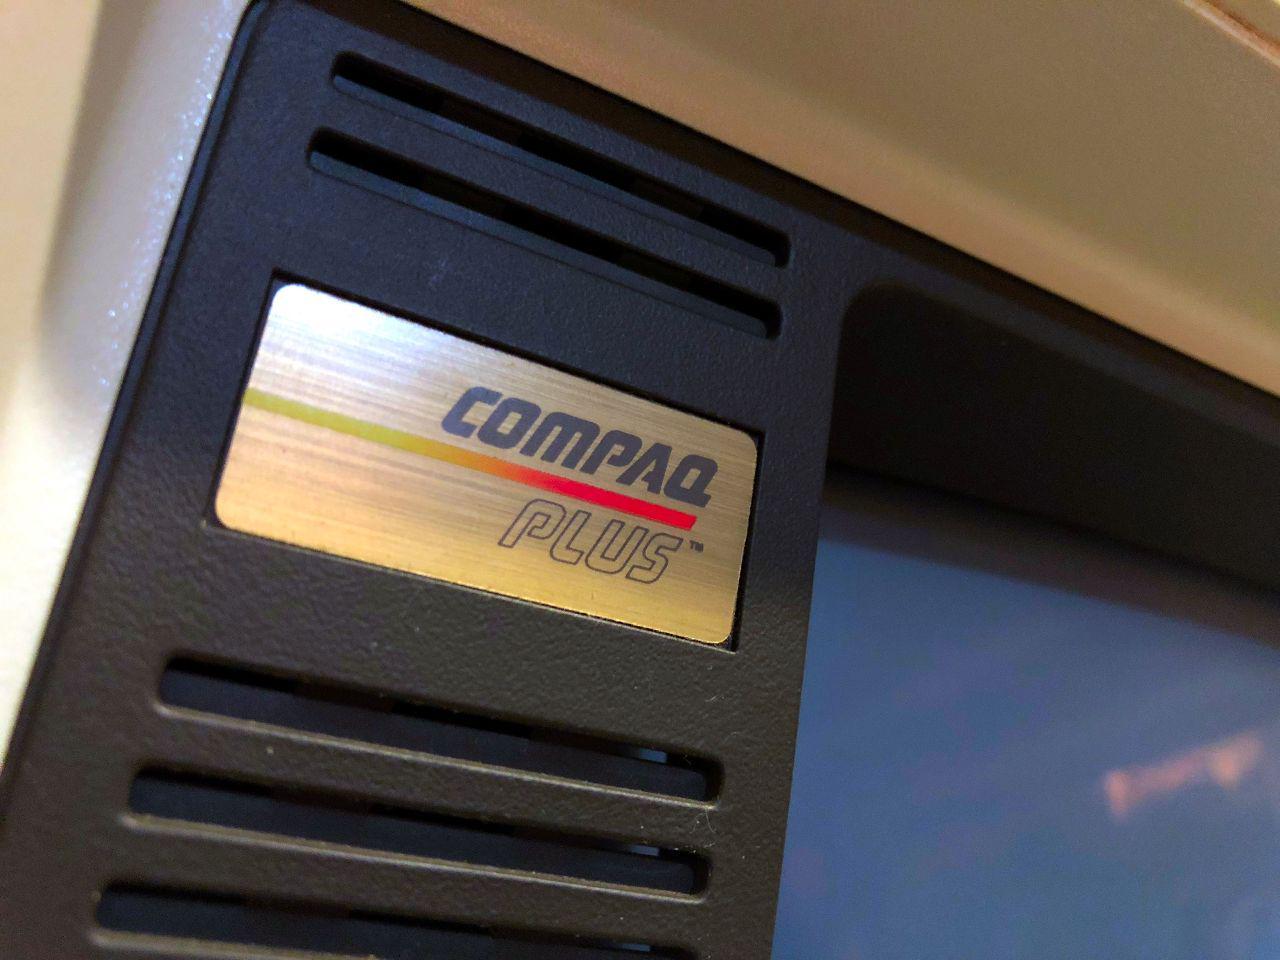 Compaq Portable